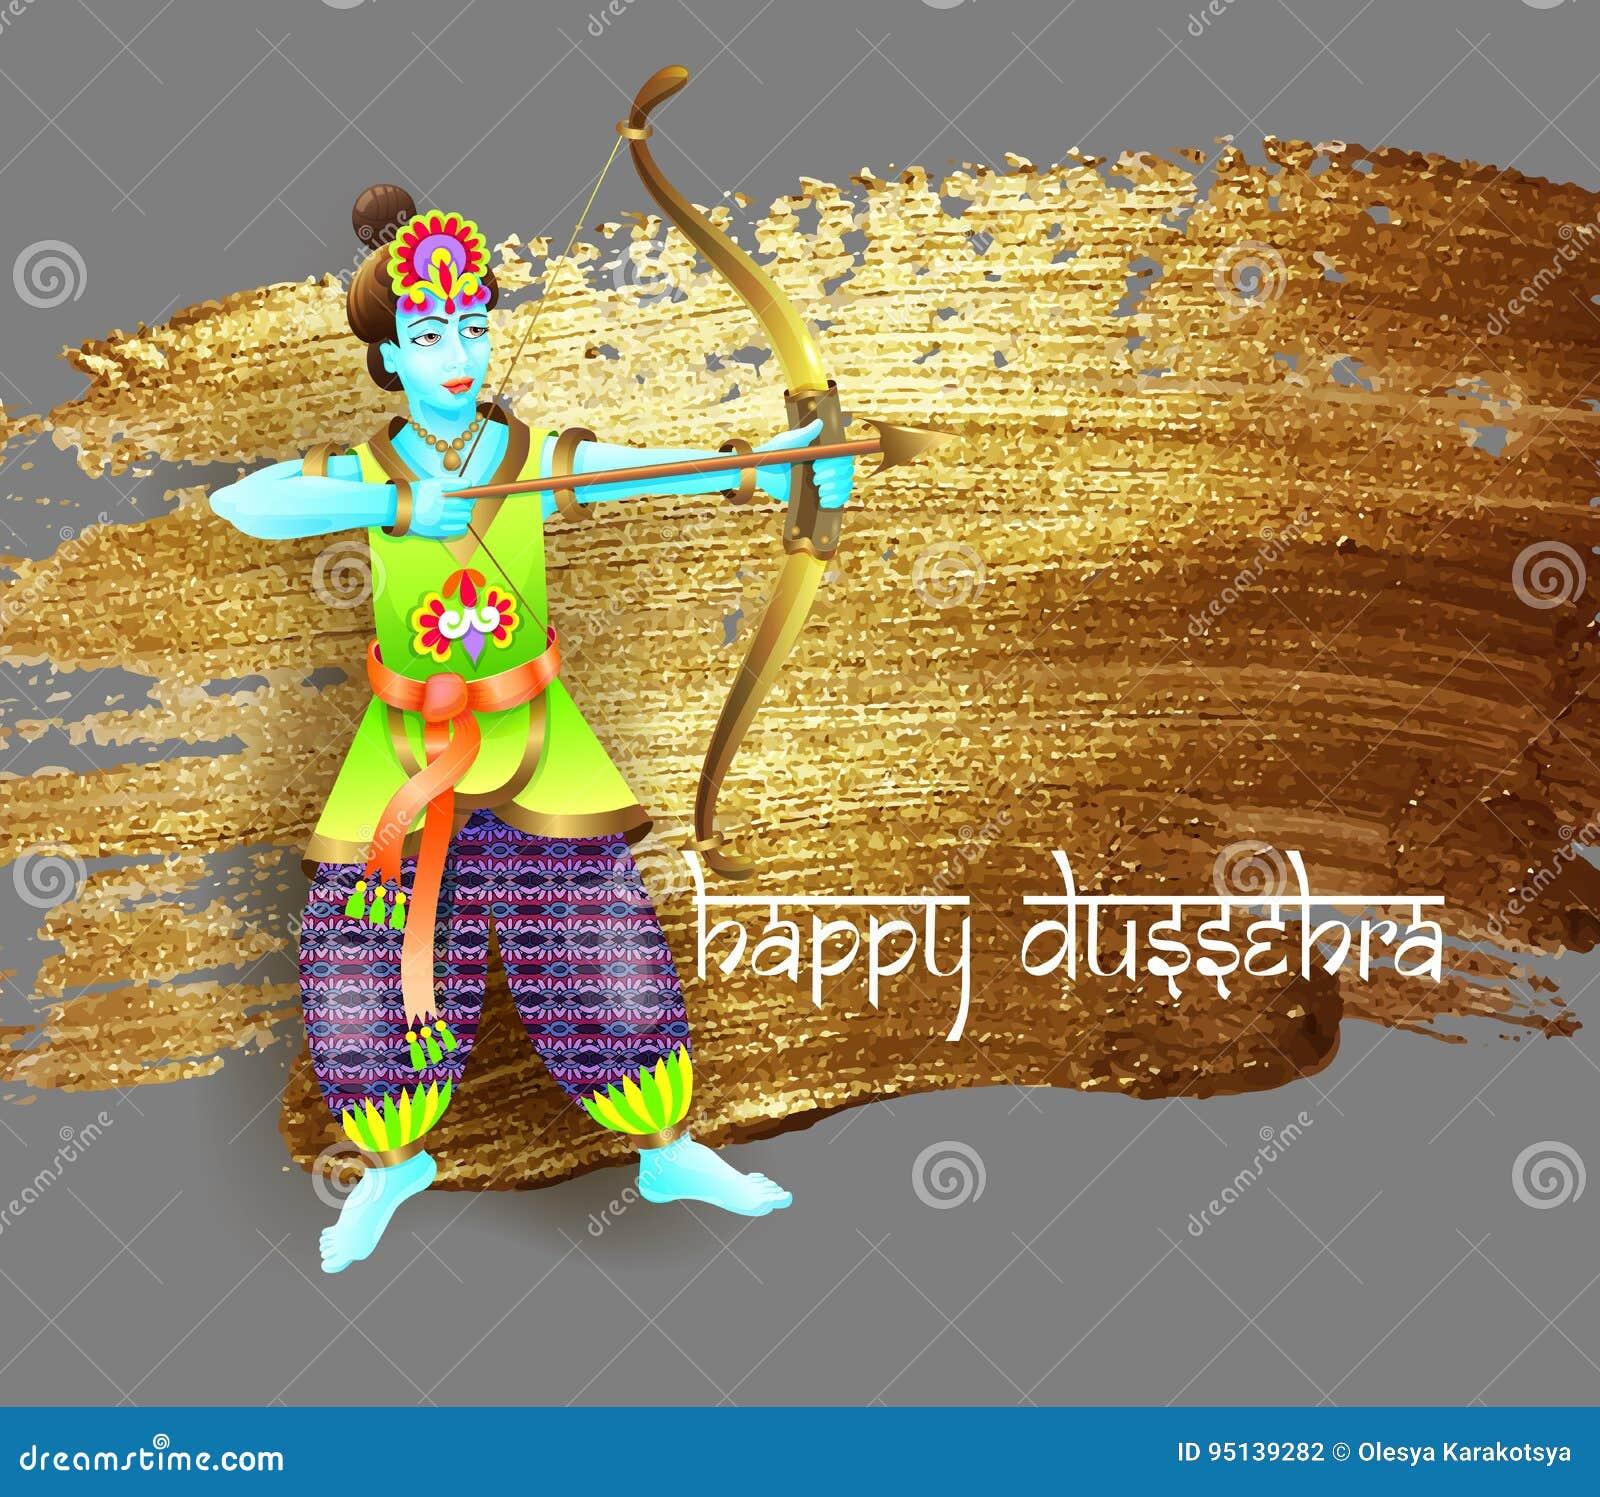 Design Krishna Shoots An Arrow From A Bow Stock Vector